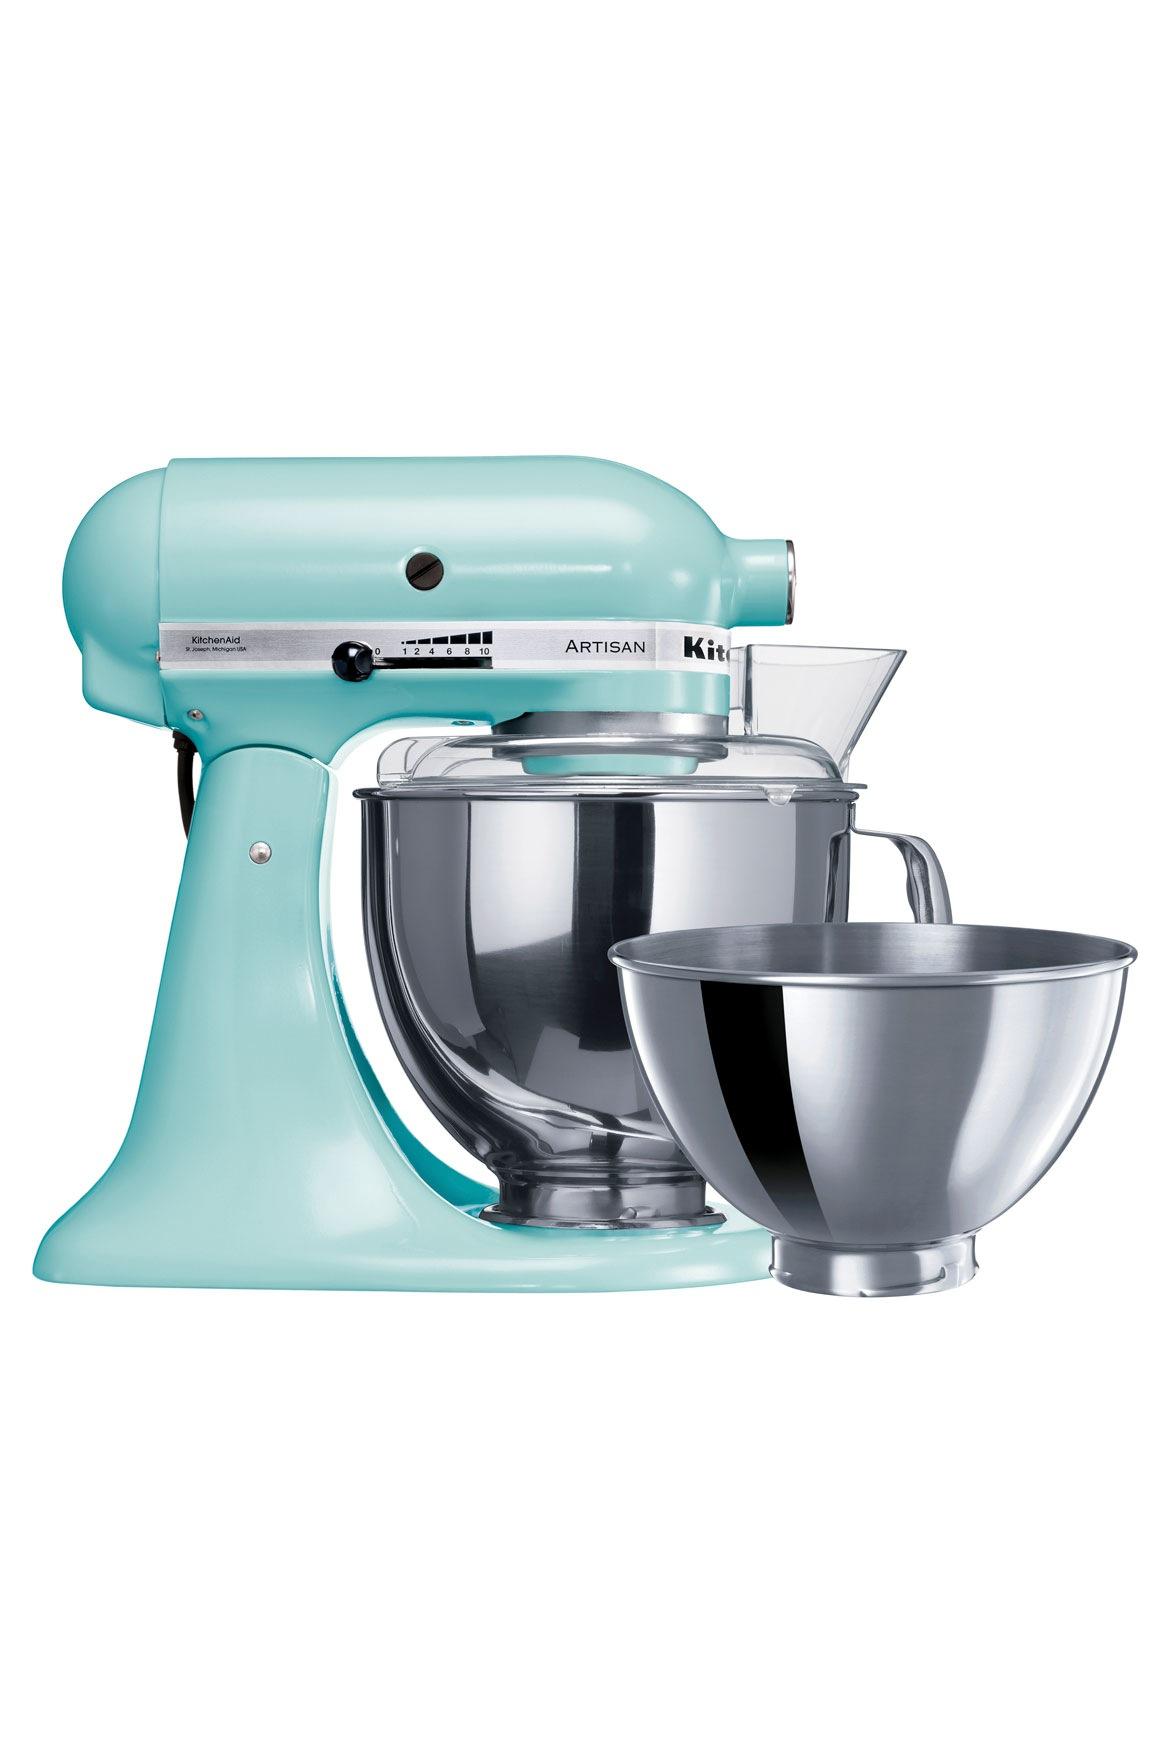 KitchenAid | KSM160 Artisan Stand Mixer: Ice 5KSM160PSAIC | Myer Online